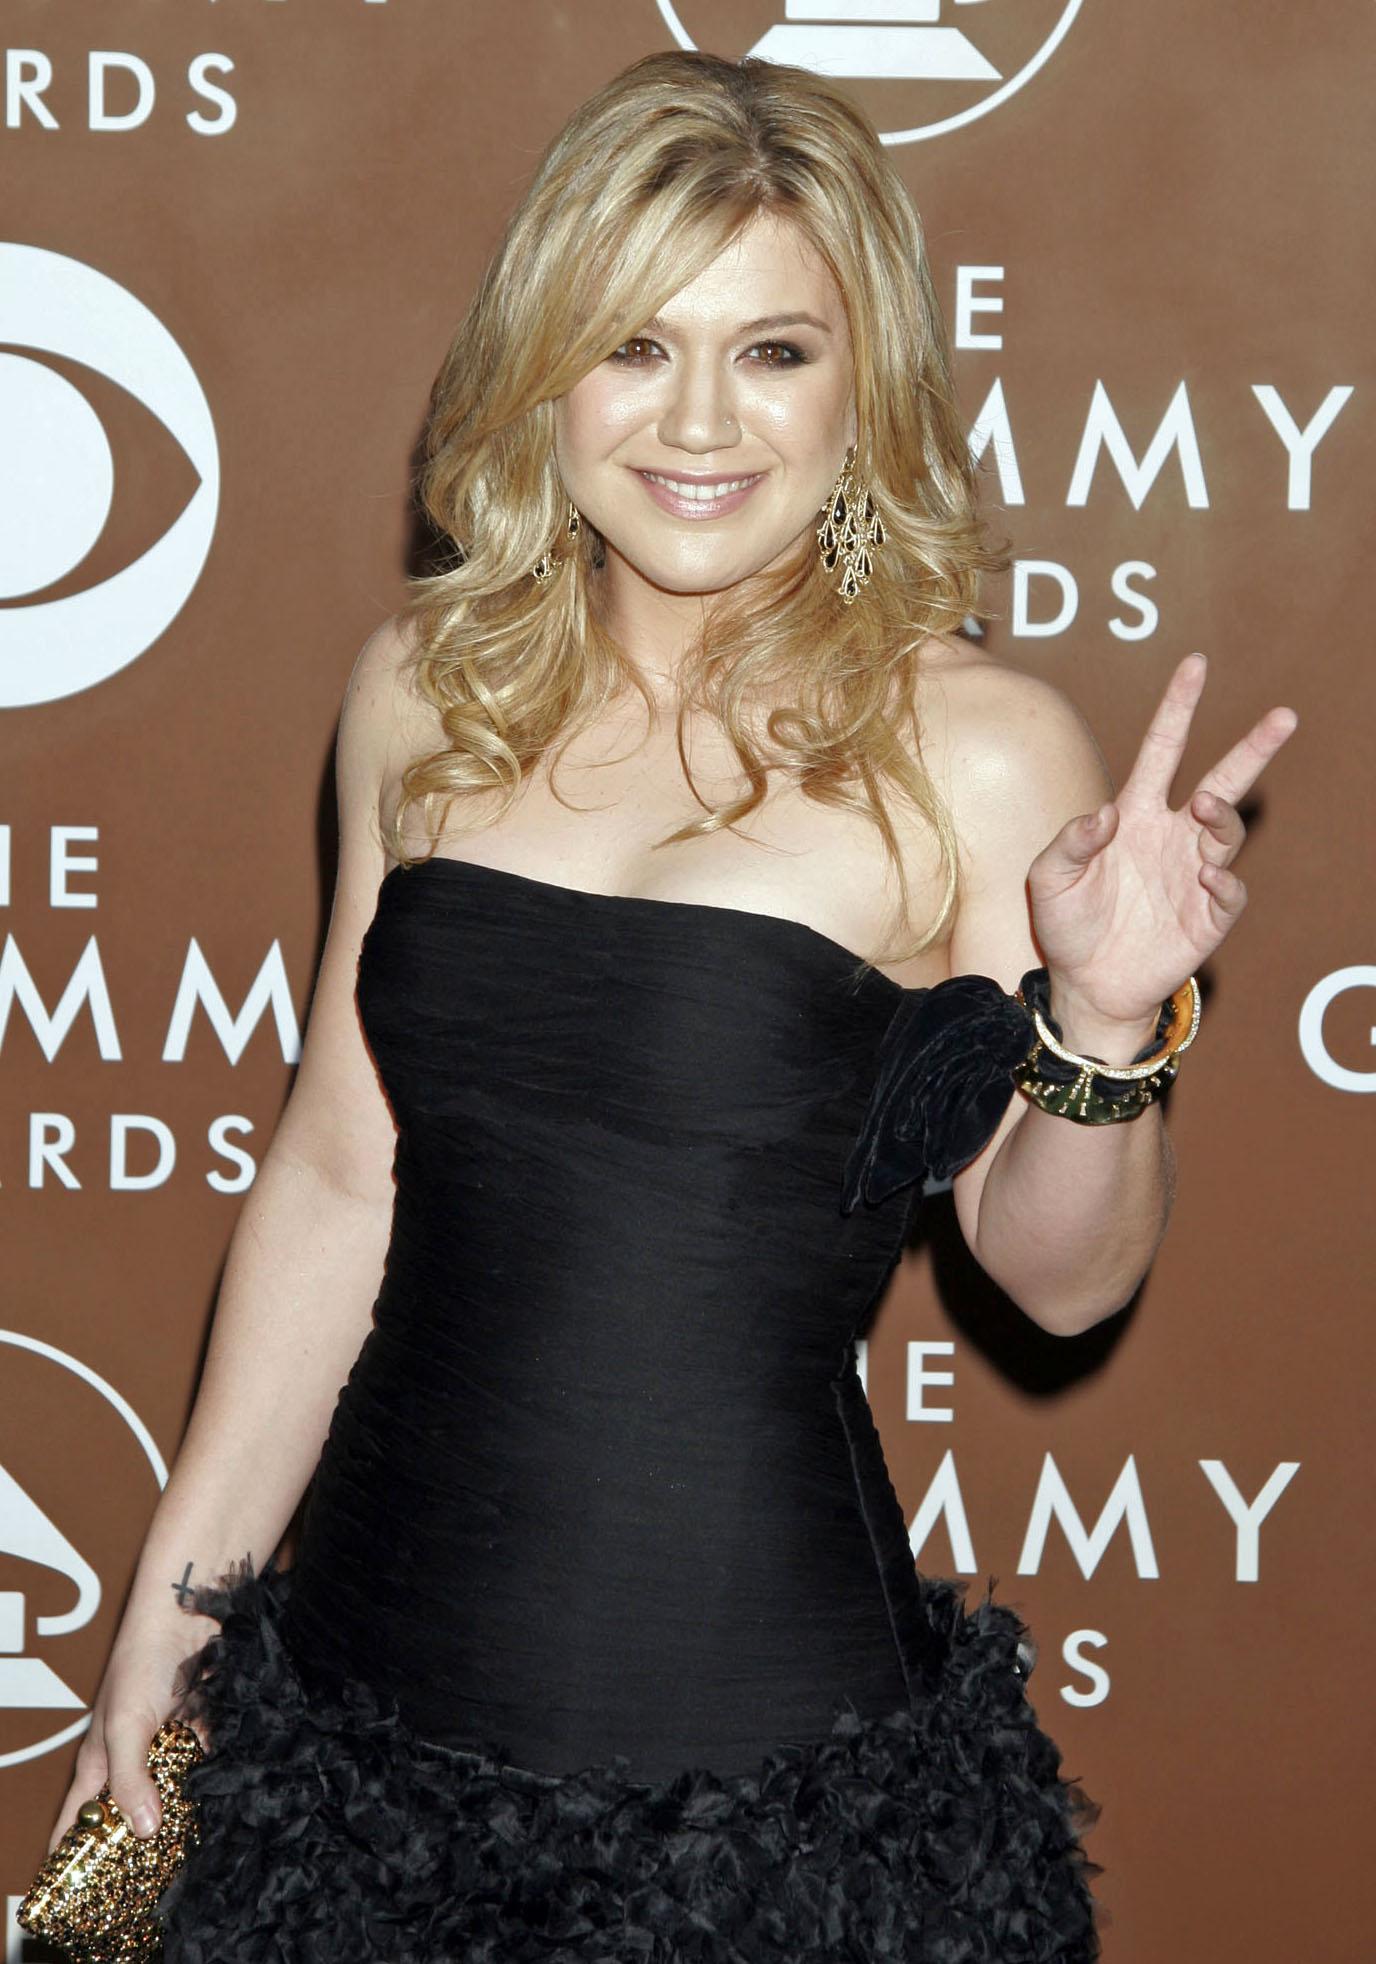 Kelly-Clarkson-2006-Grammys